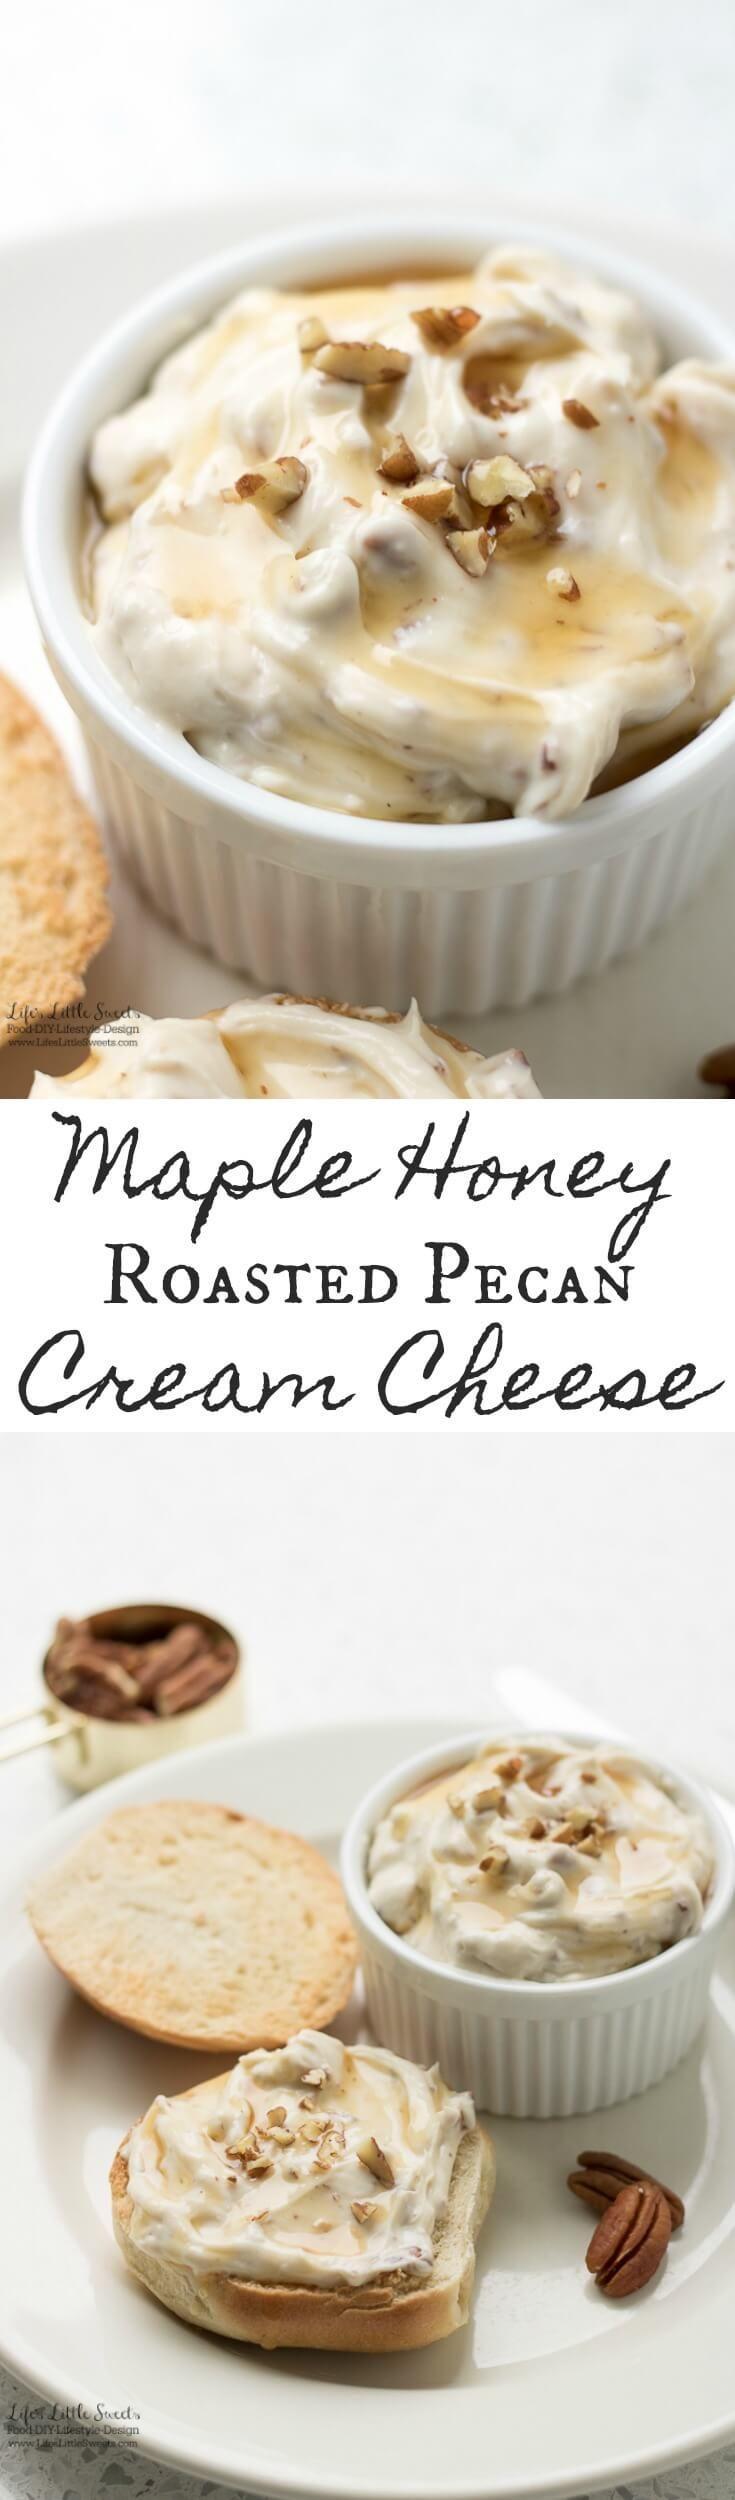 Wedding - Maple Honey Roasted Pecan Cream Cheese